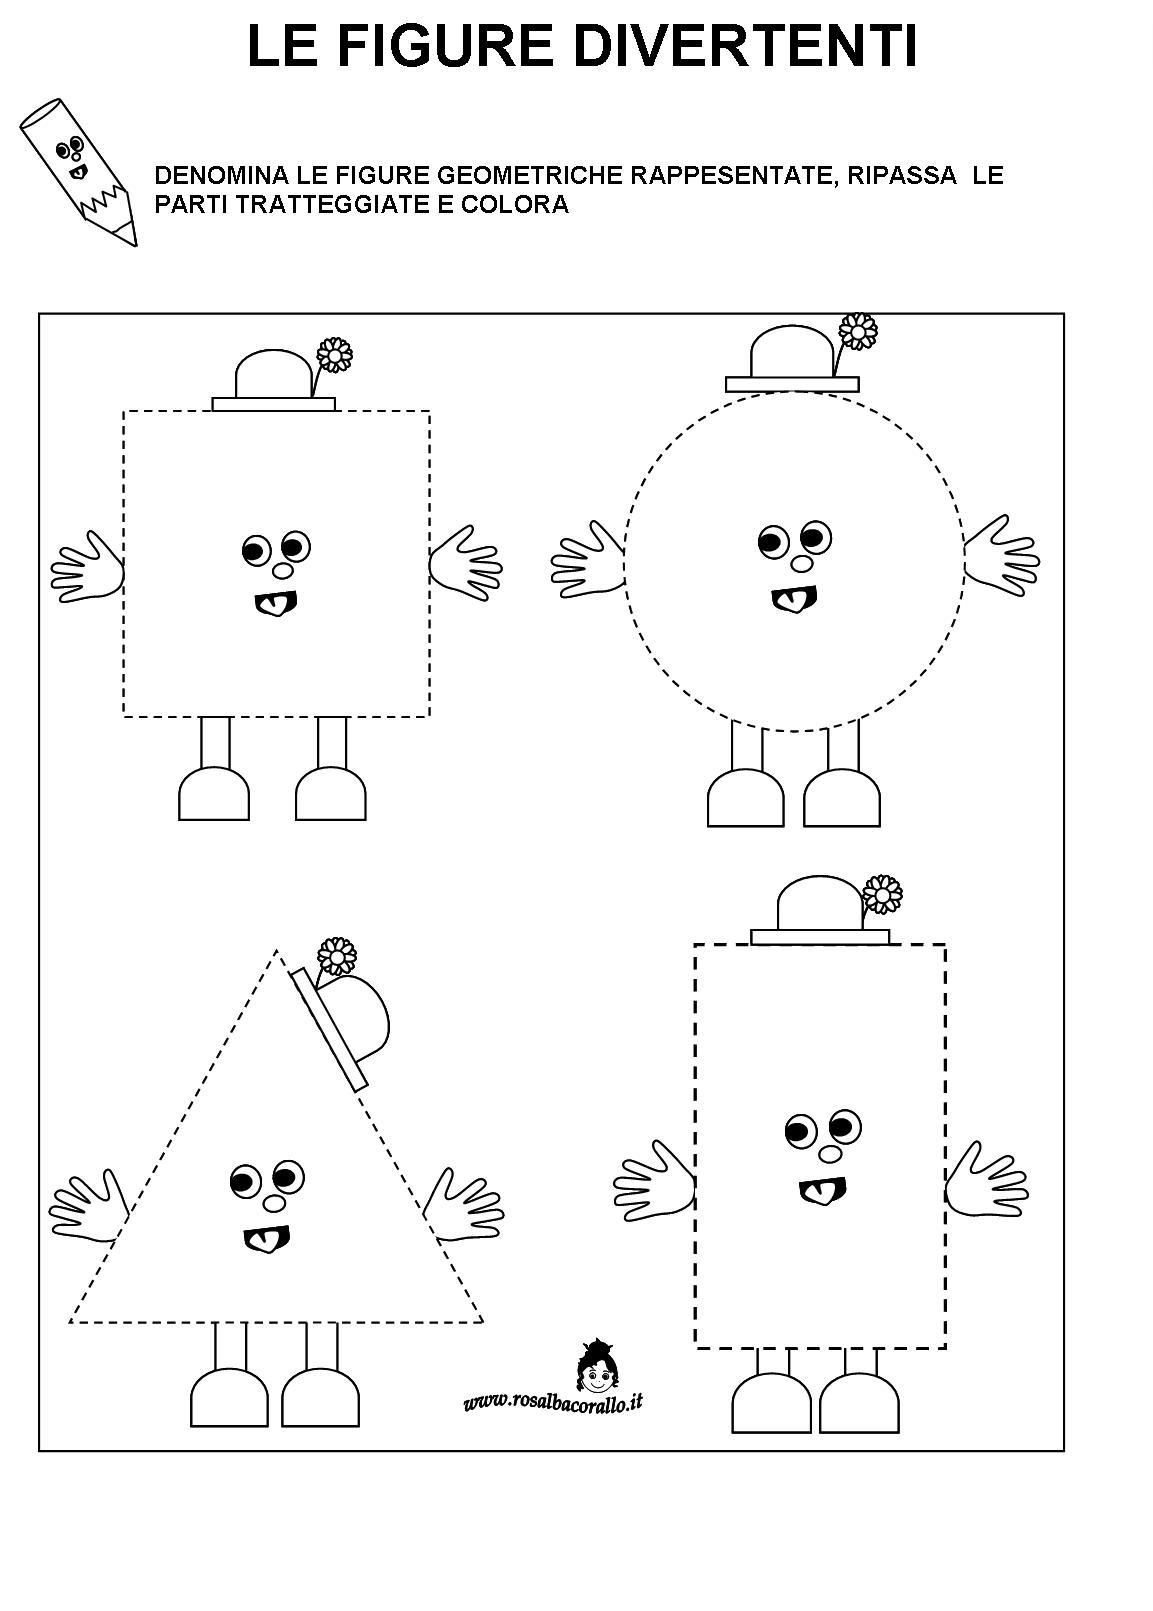 Eccezionale Schede didattiche Figure geometriche per bambini di 4/5 anni UU36